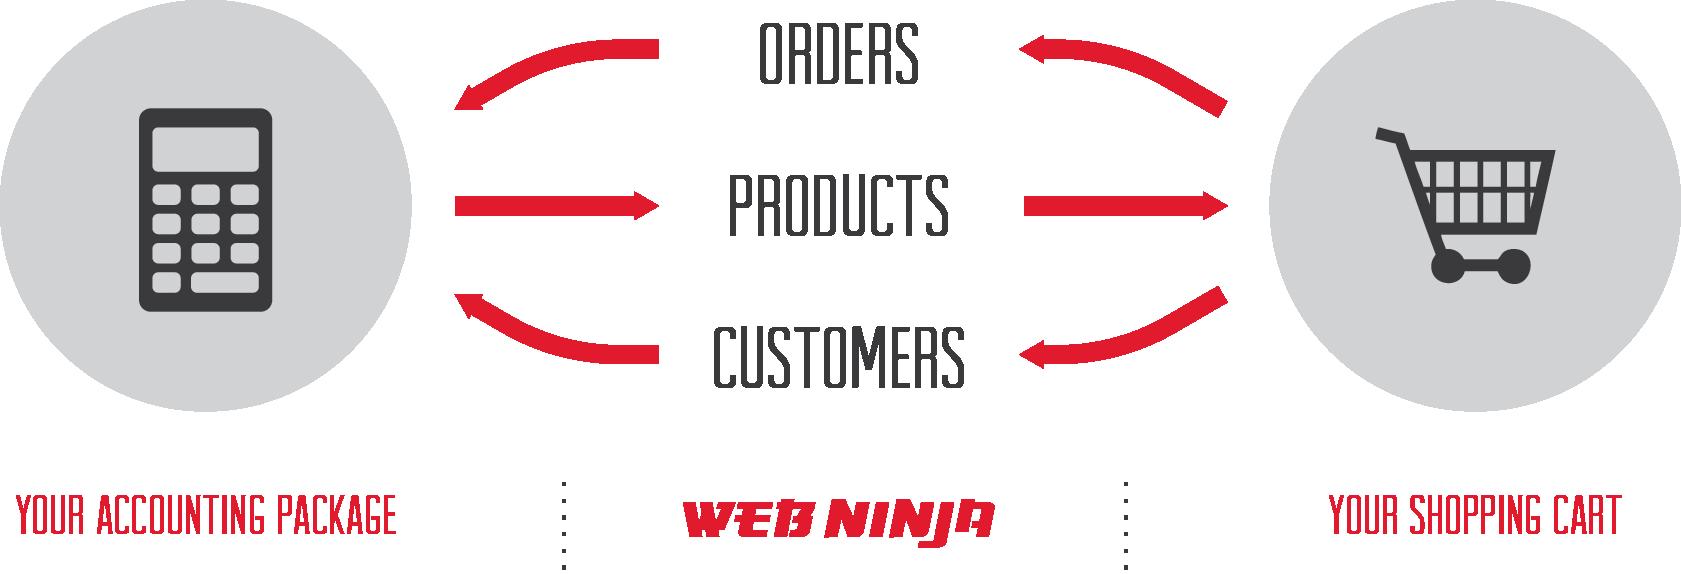 NinjaIntegrationDiagram.png